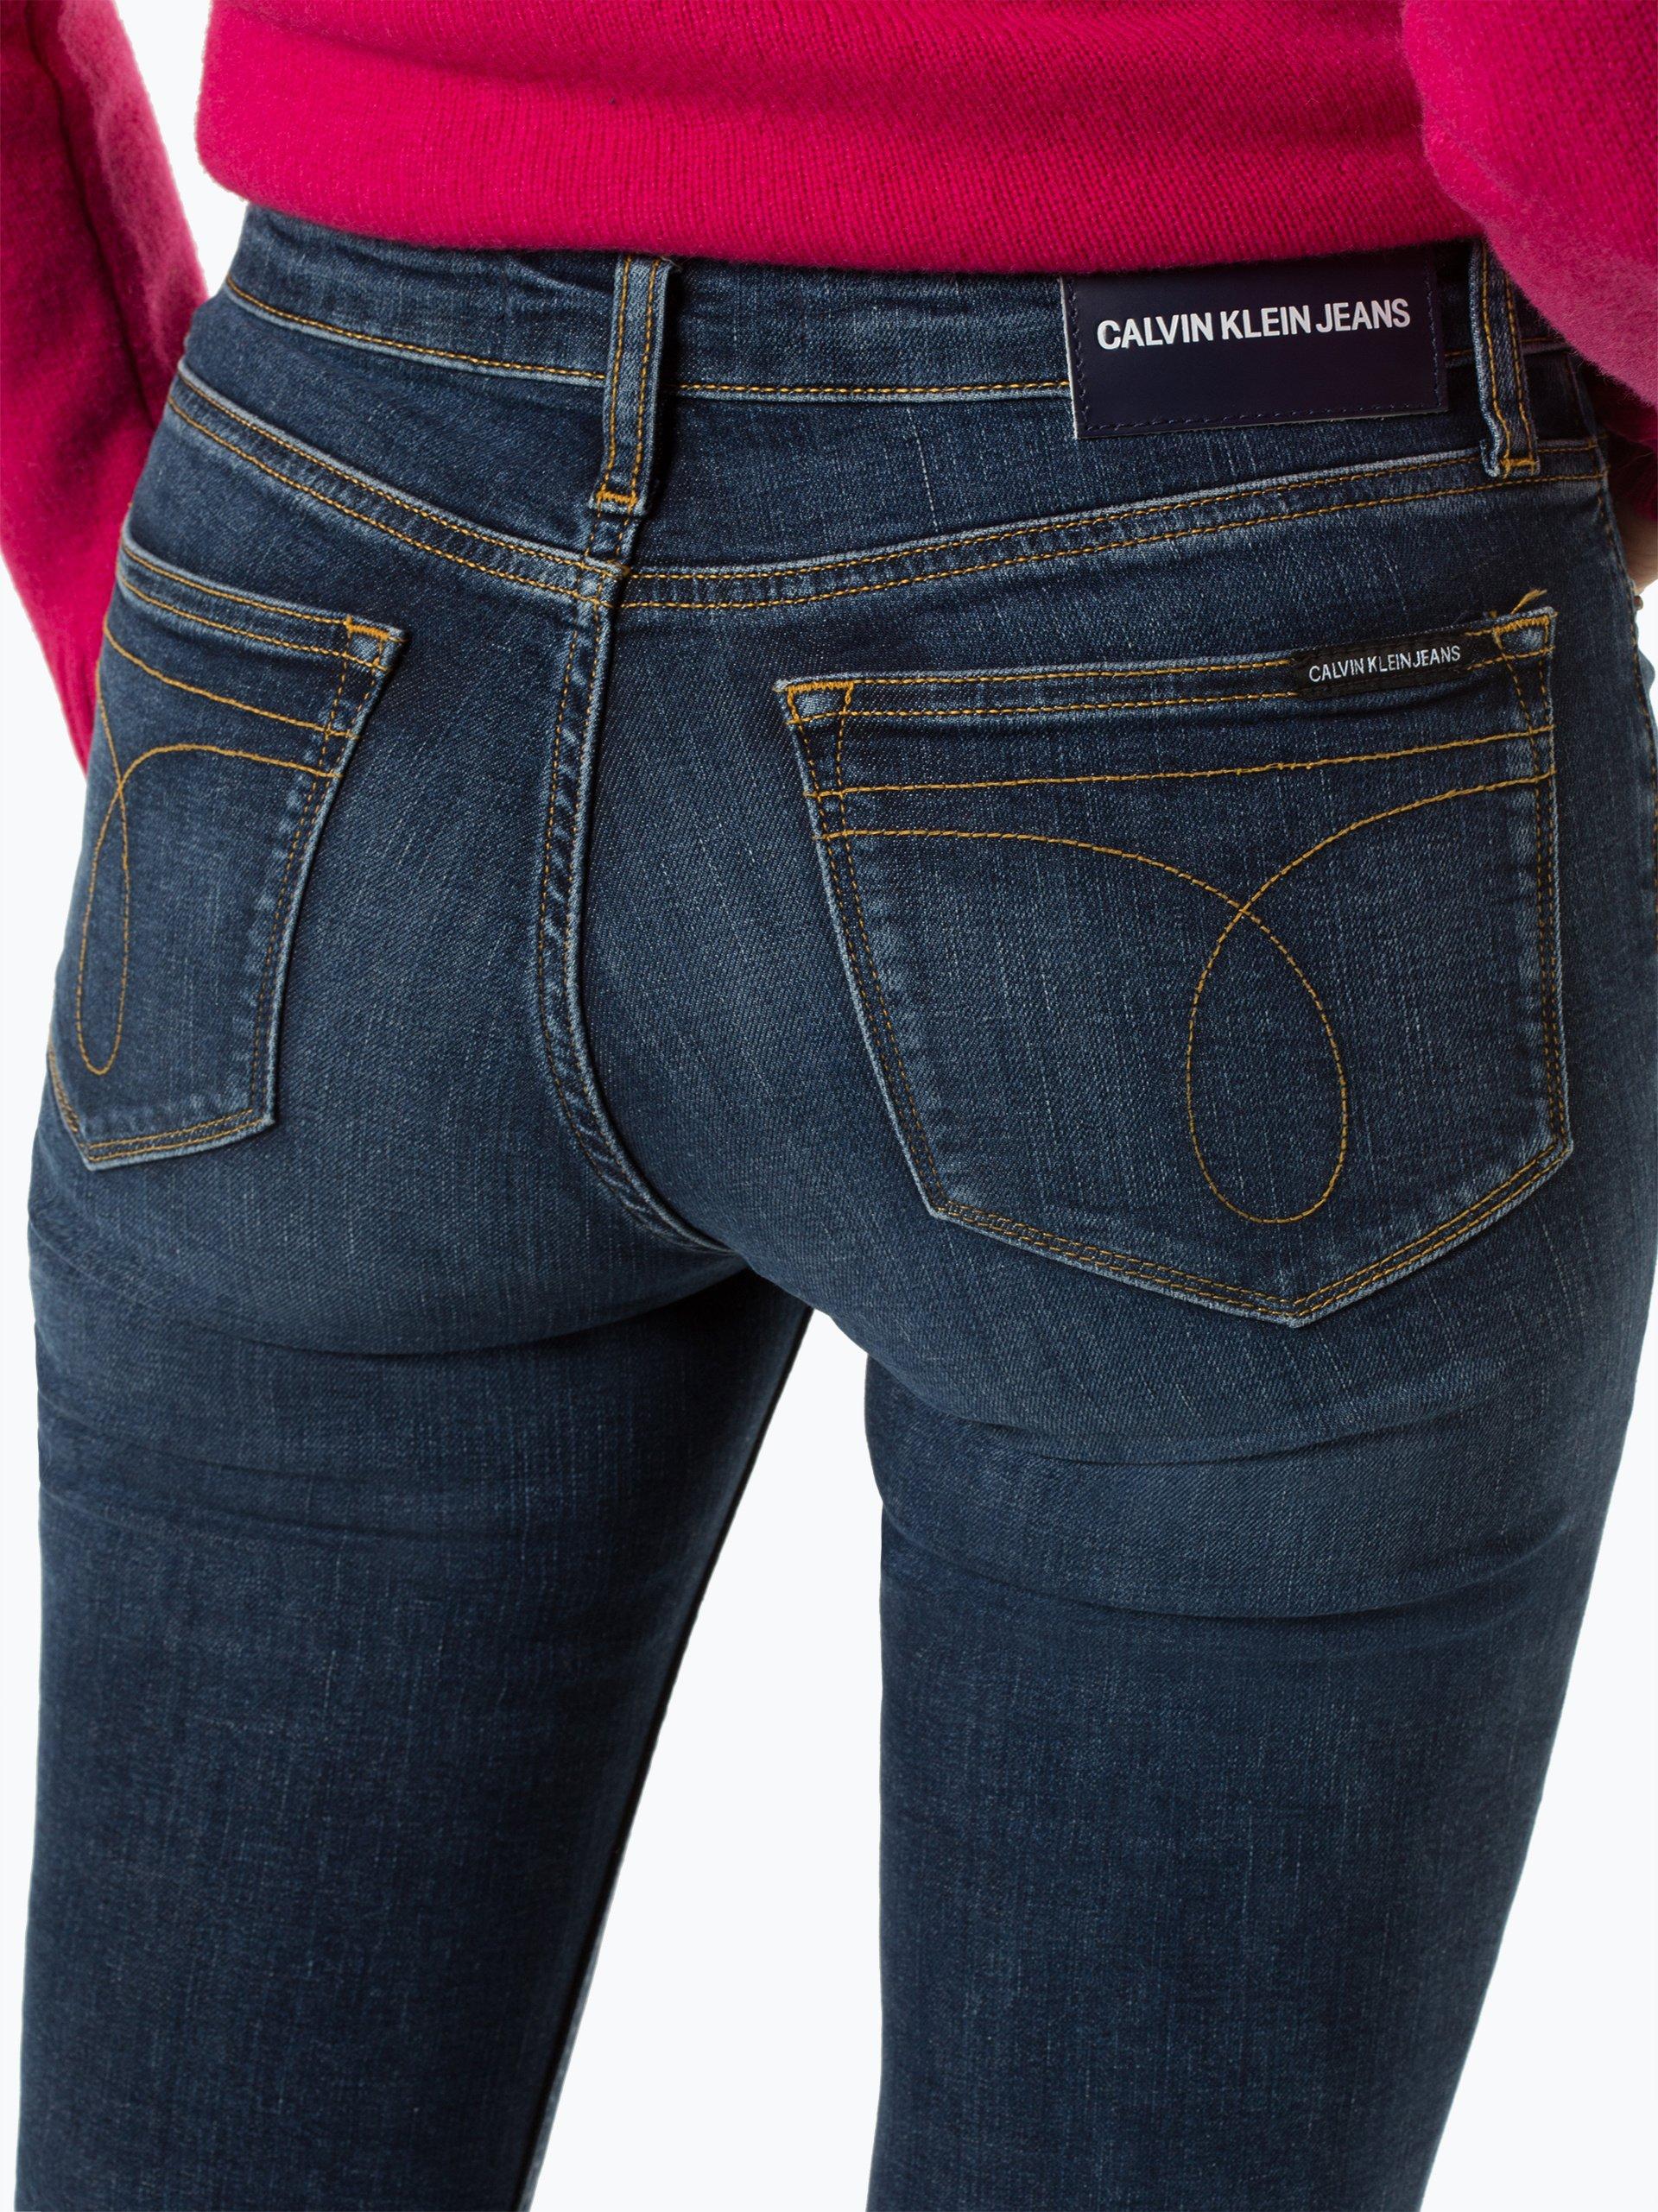 Calvin Klein Jeans Damen Jeans - CKJ 011